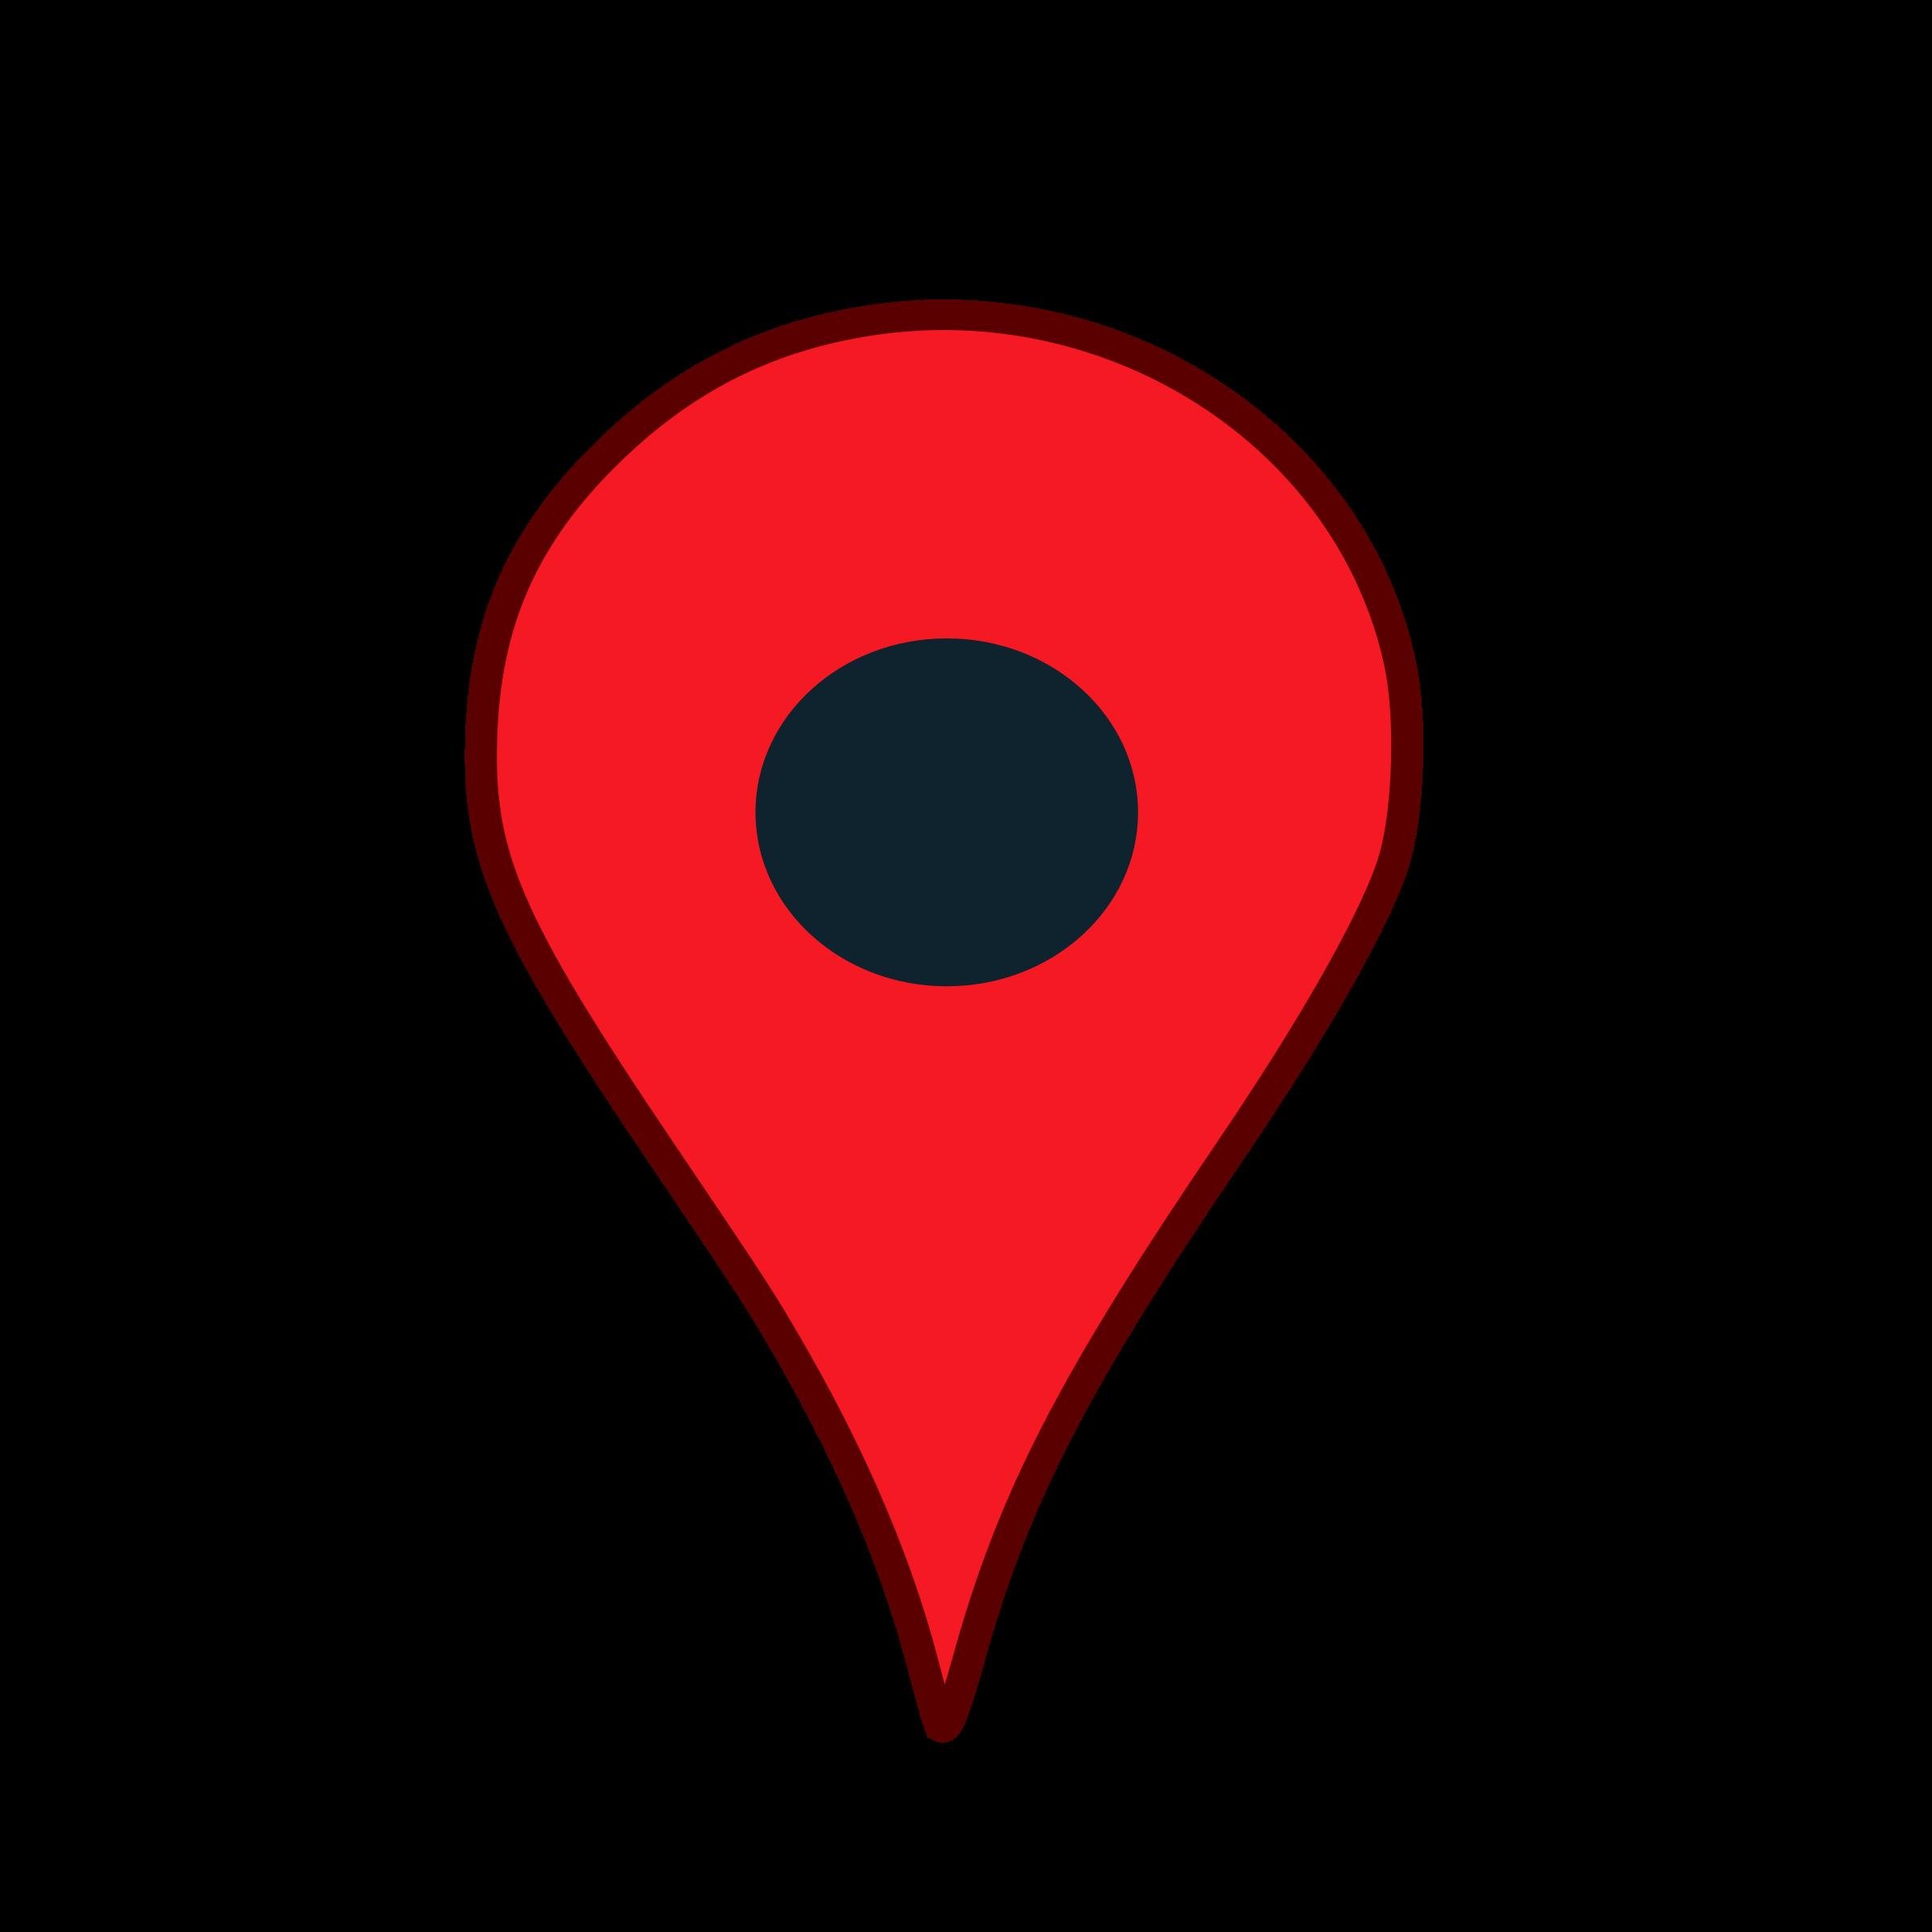 Map pin png #39460.